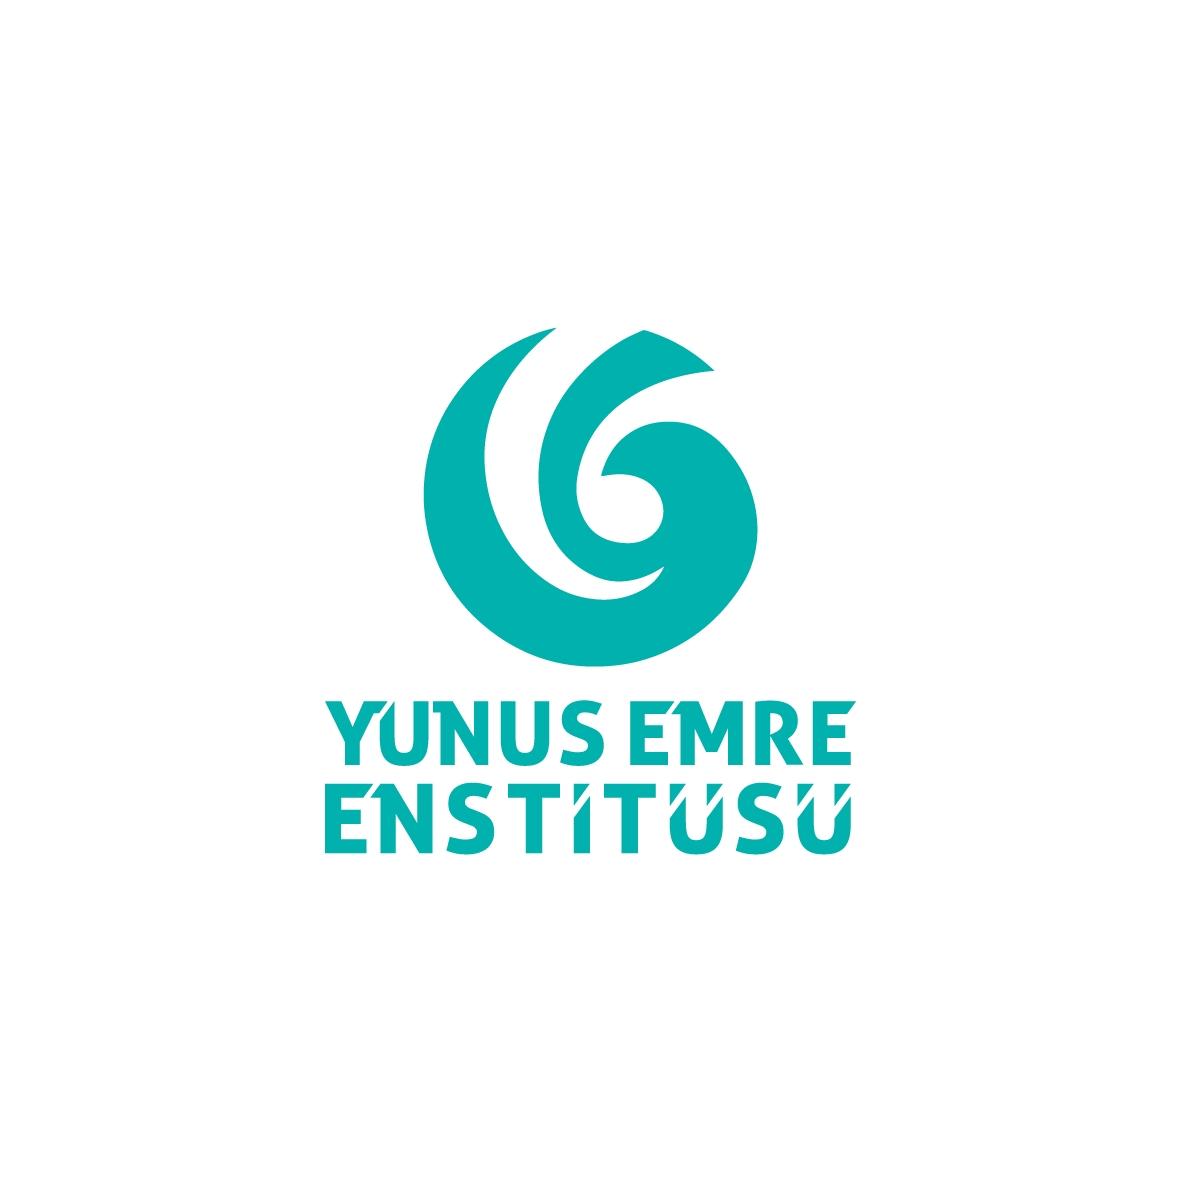 Yunus Emre Enstitüsü - Beograd